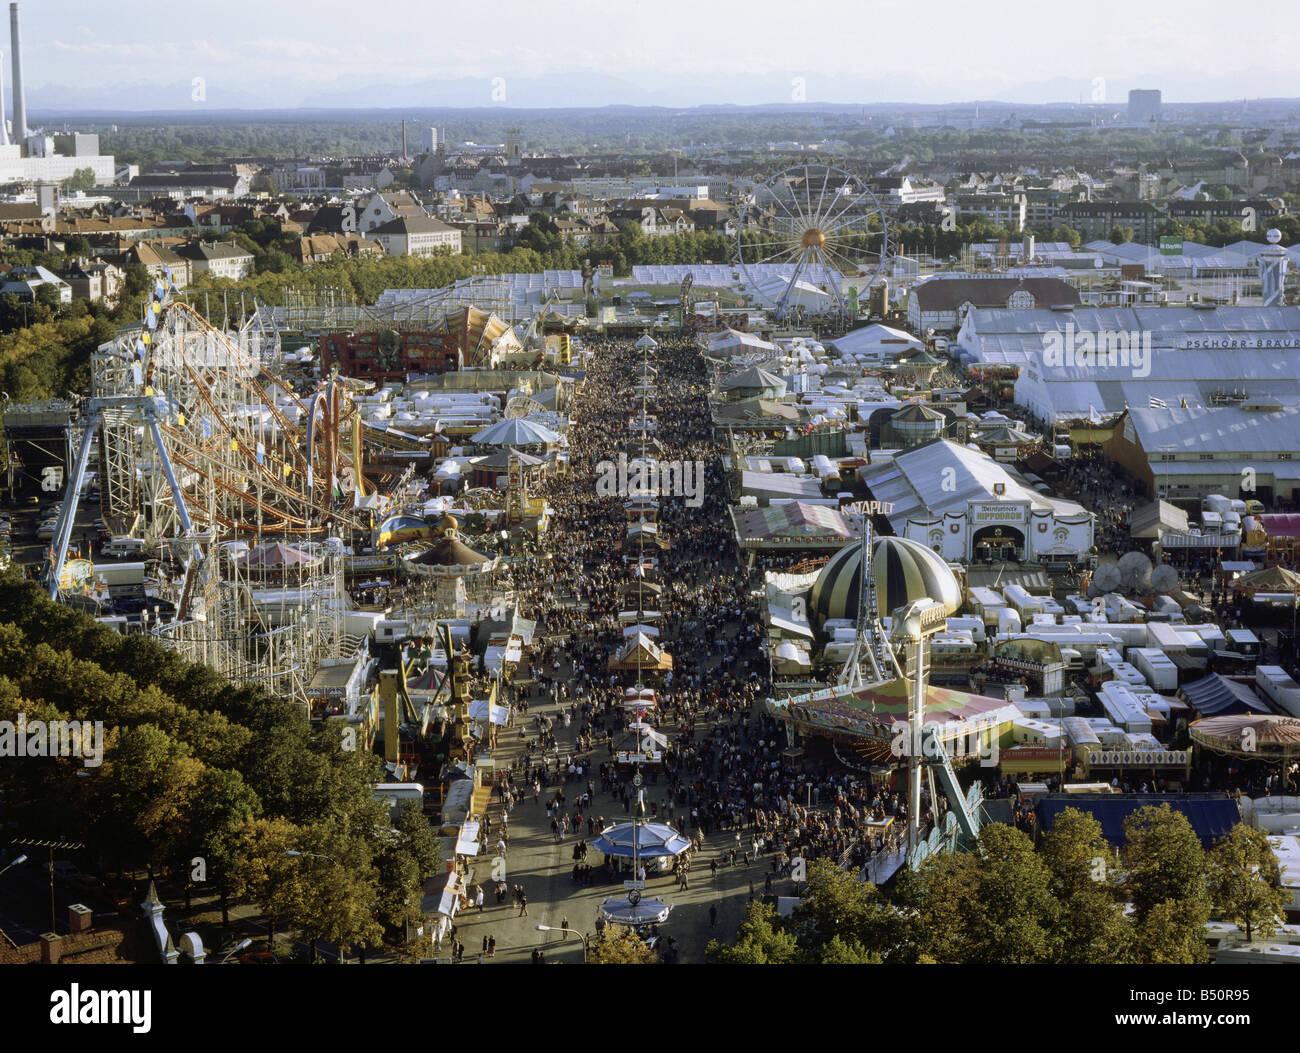 geography / travel, Germany, Bavaria, Munich, Oktoberfest, overview, view from 'Paulskirche' to Oktoberfest - Stock Image